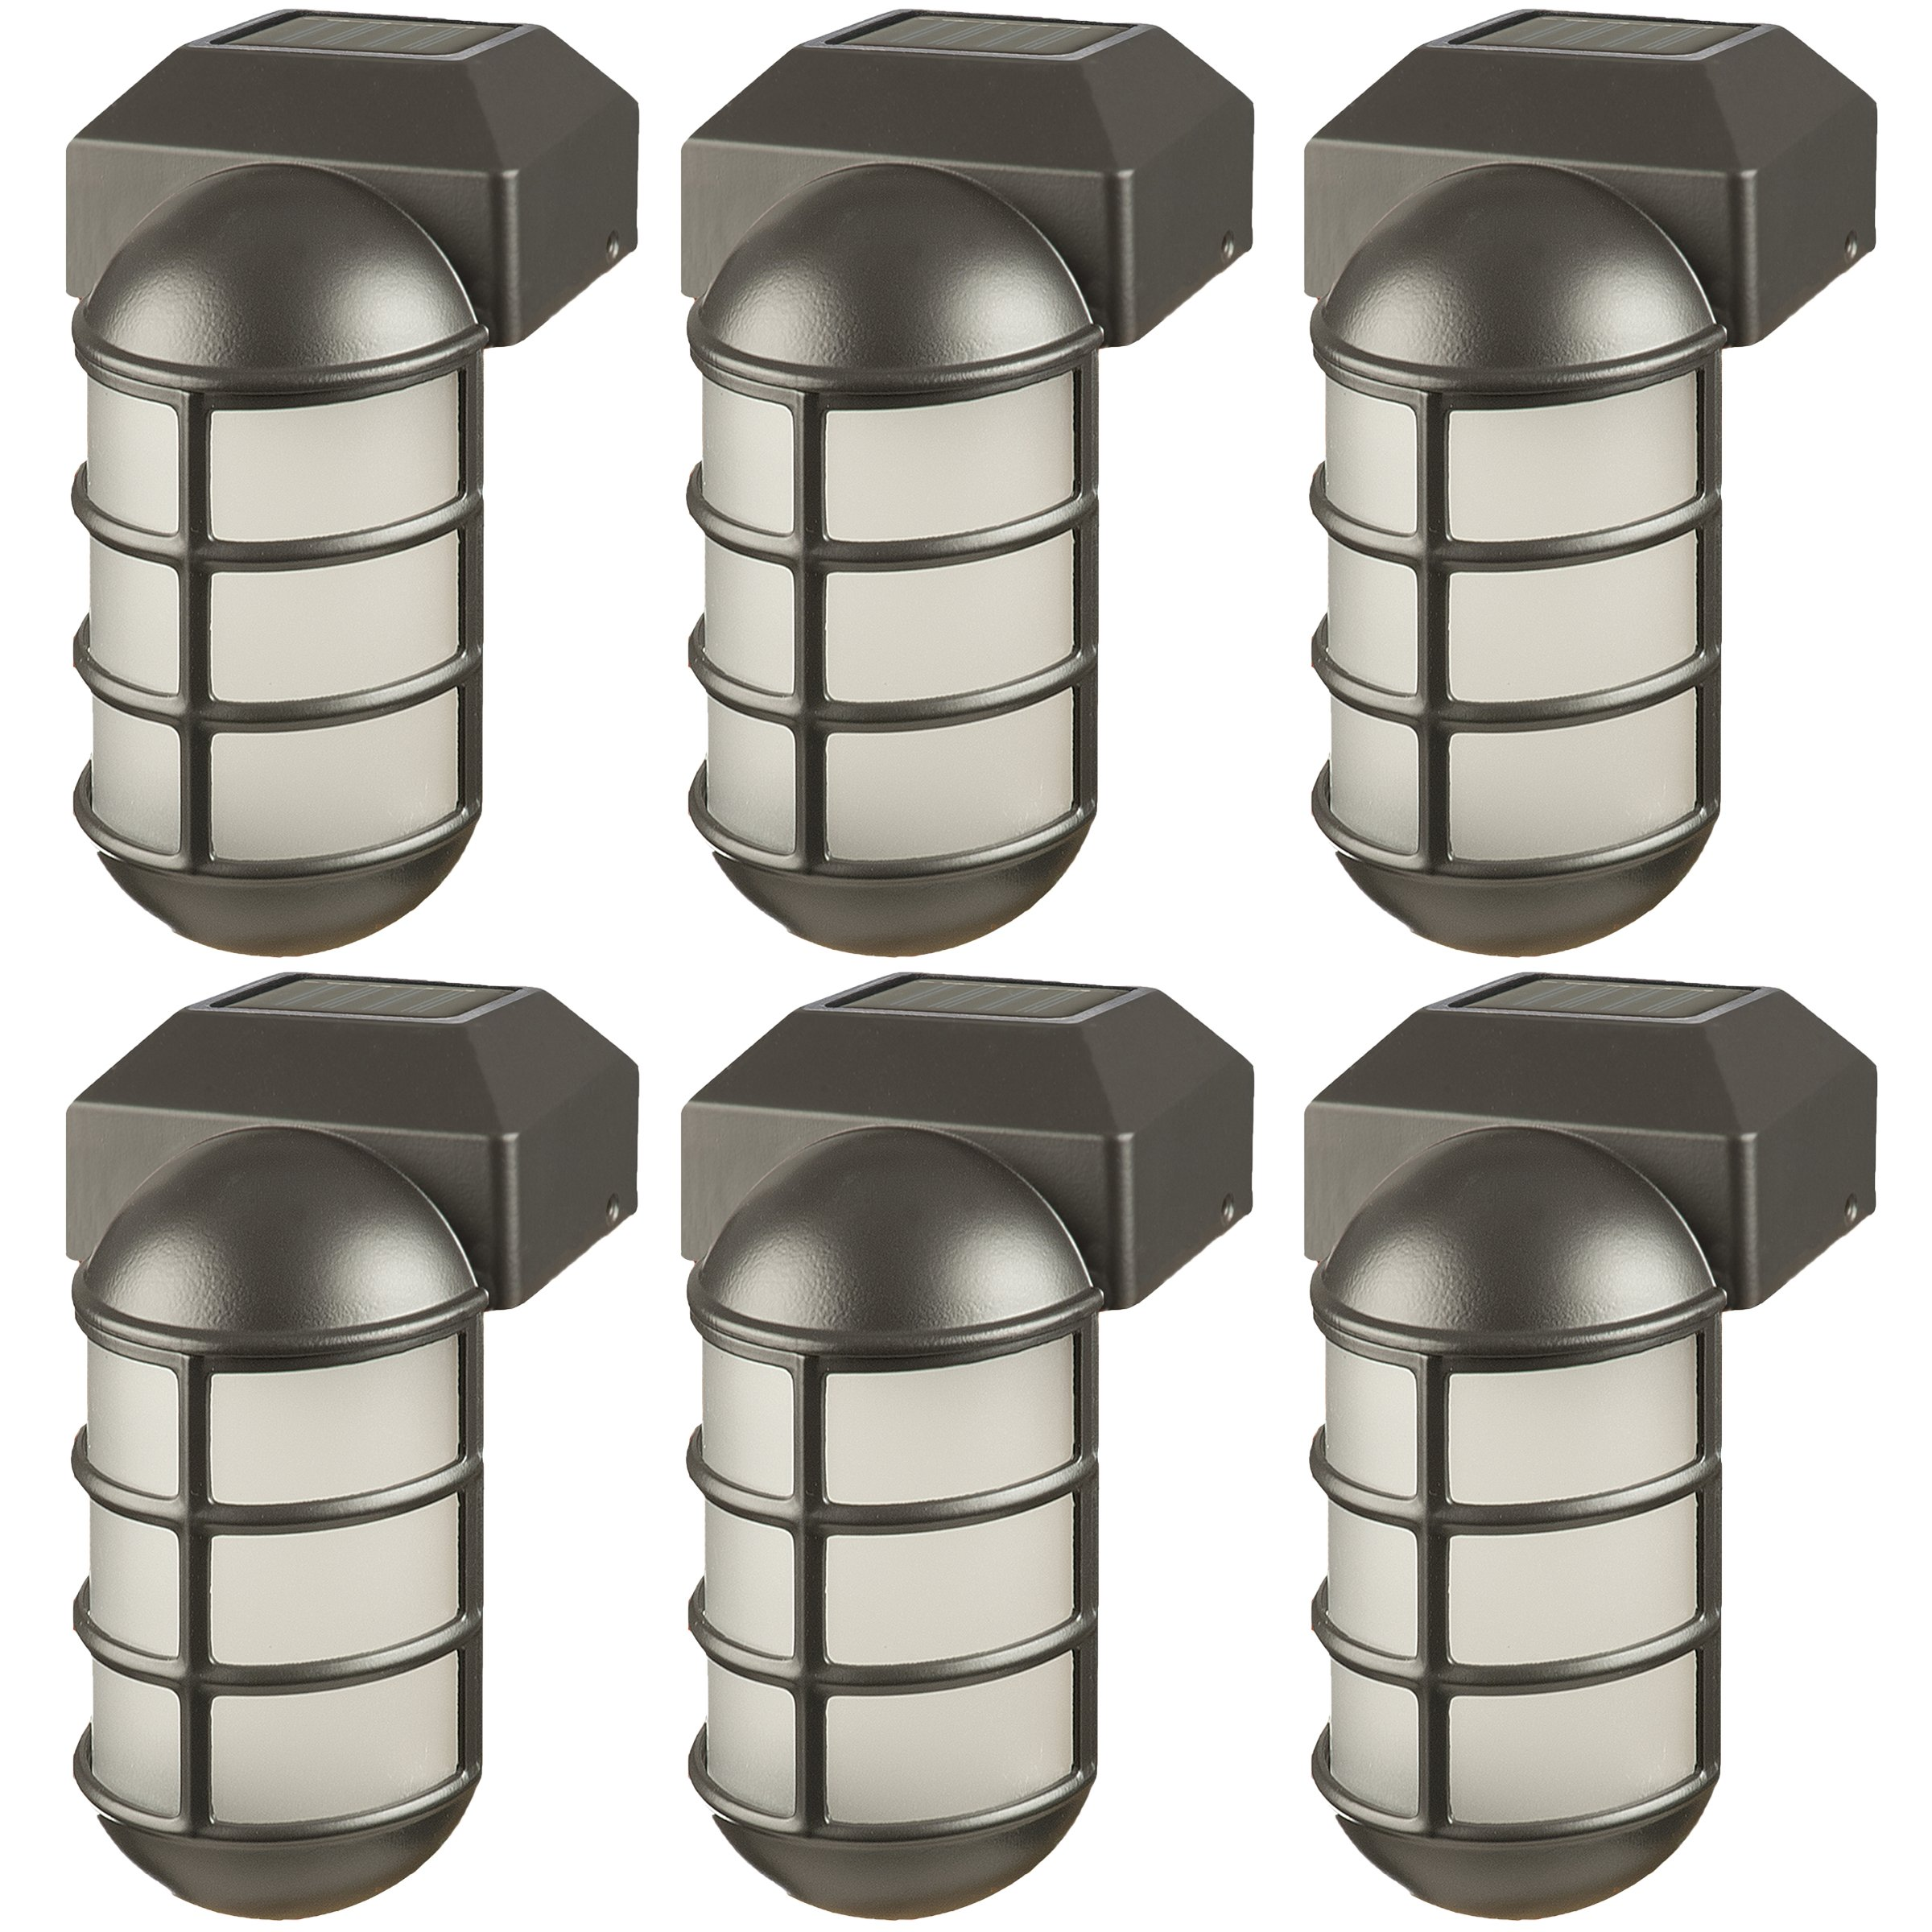 Paradise GL23877BK Solar Aluminum LED Post Cap Light for 4 x 4 Wood Posts (Black, 6 Pack)